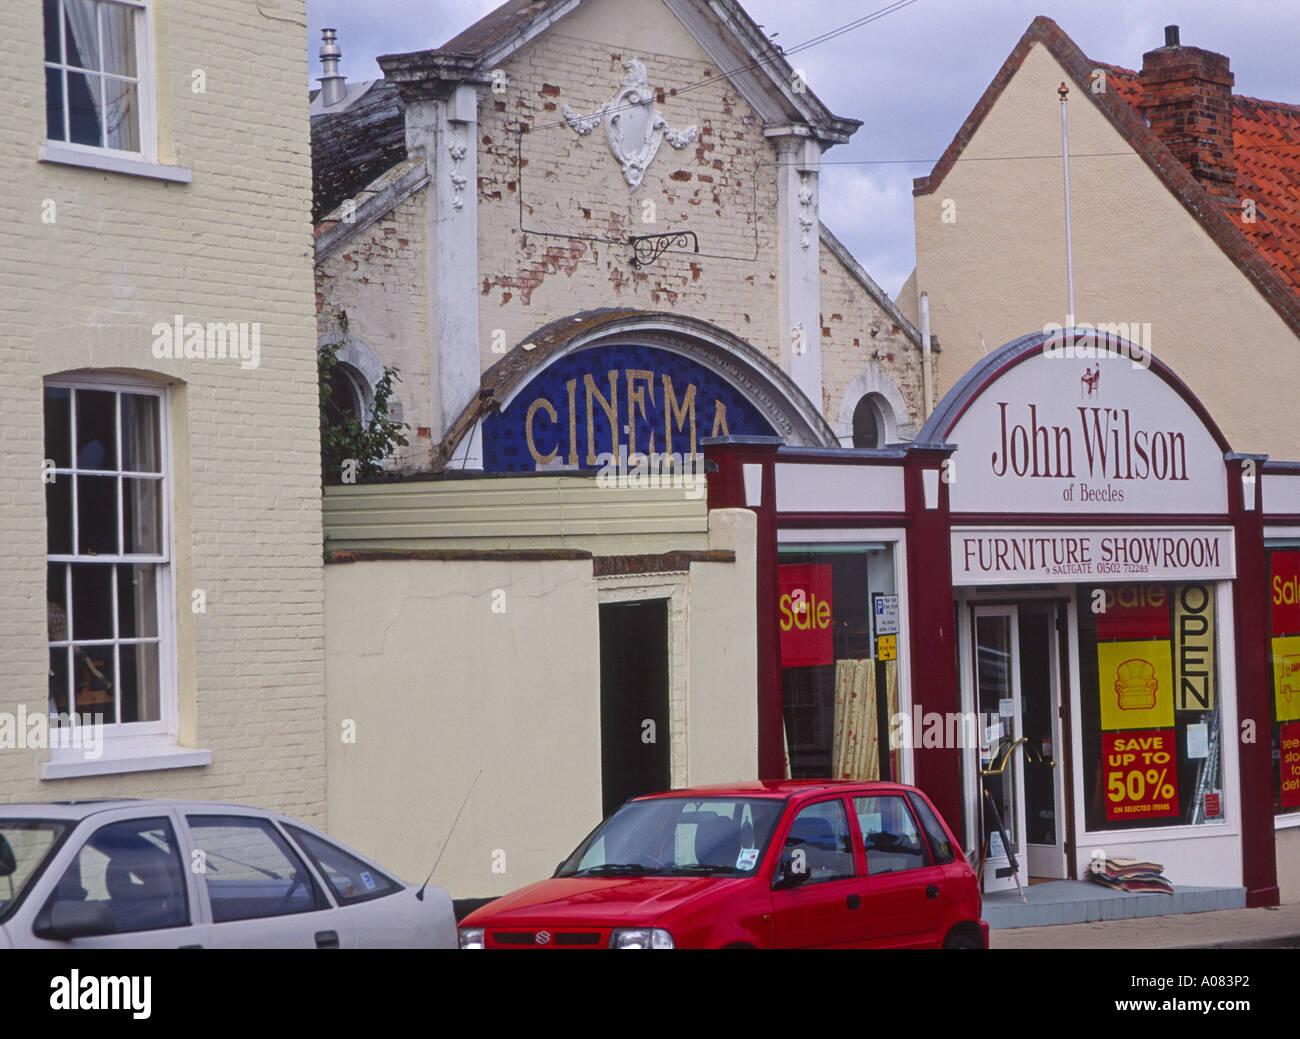 Cinéma fermé converti en showroom boutique Beccles Suffolk Angleterre Photo Stock